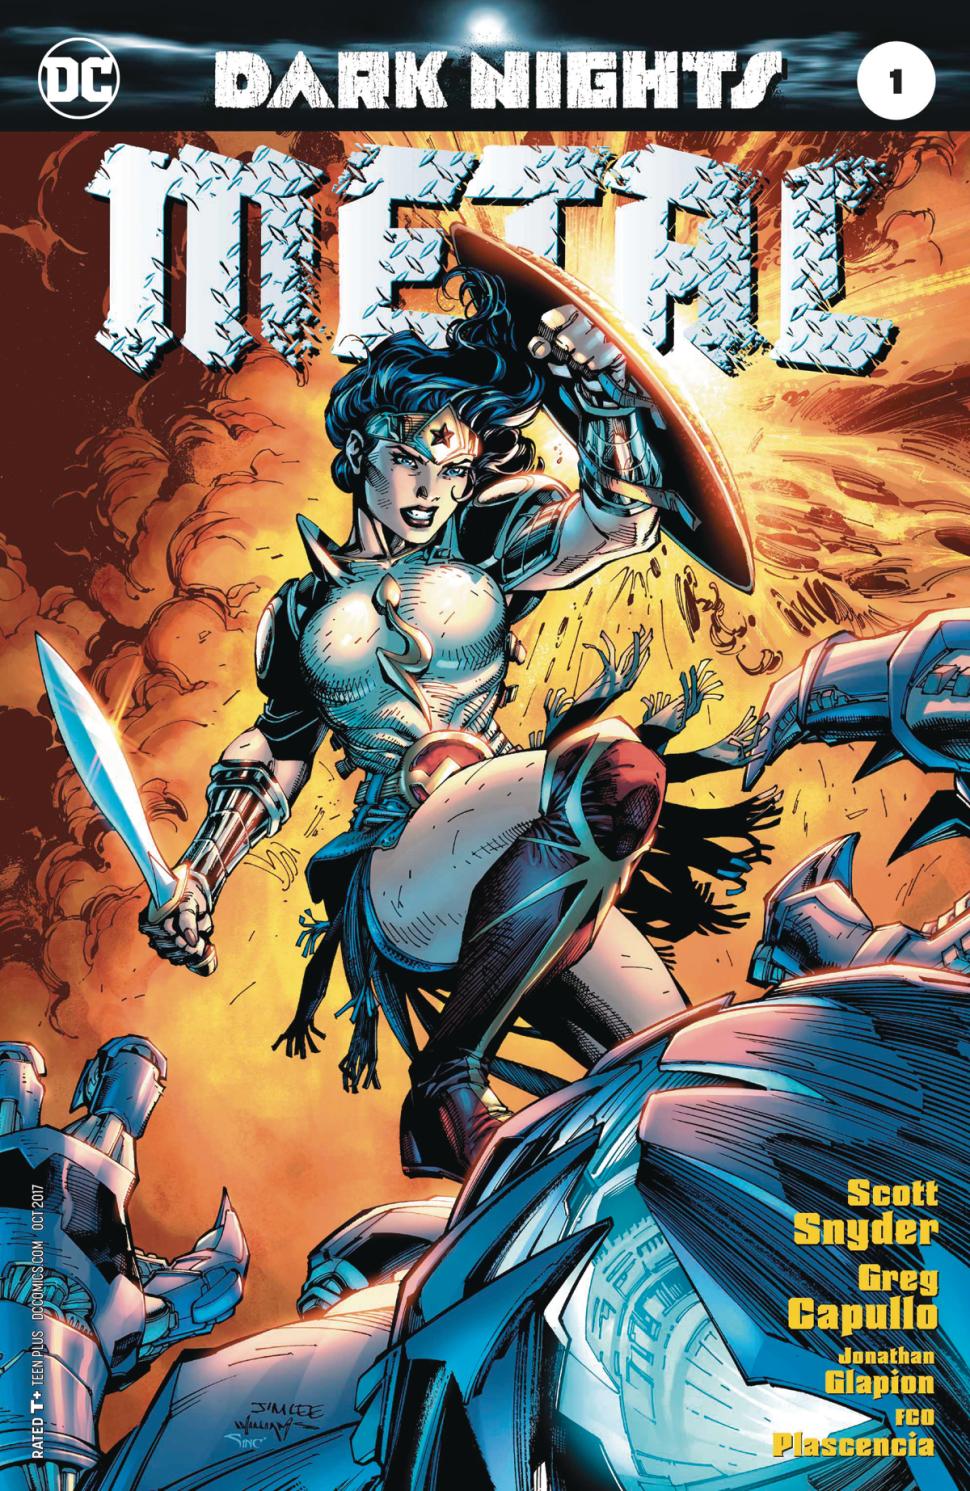 Batman Is a Jerk in DC's New 'Dark Nights: Metal'